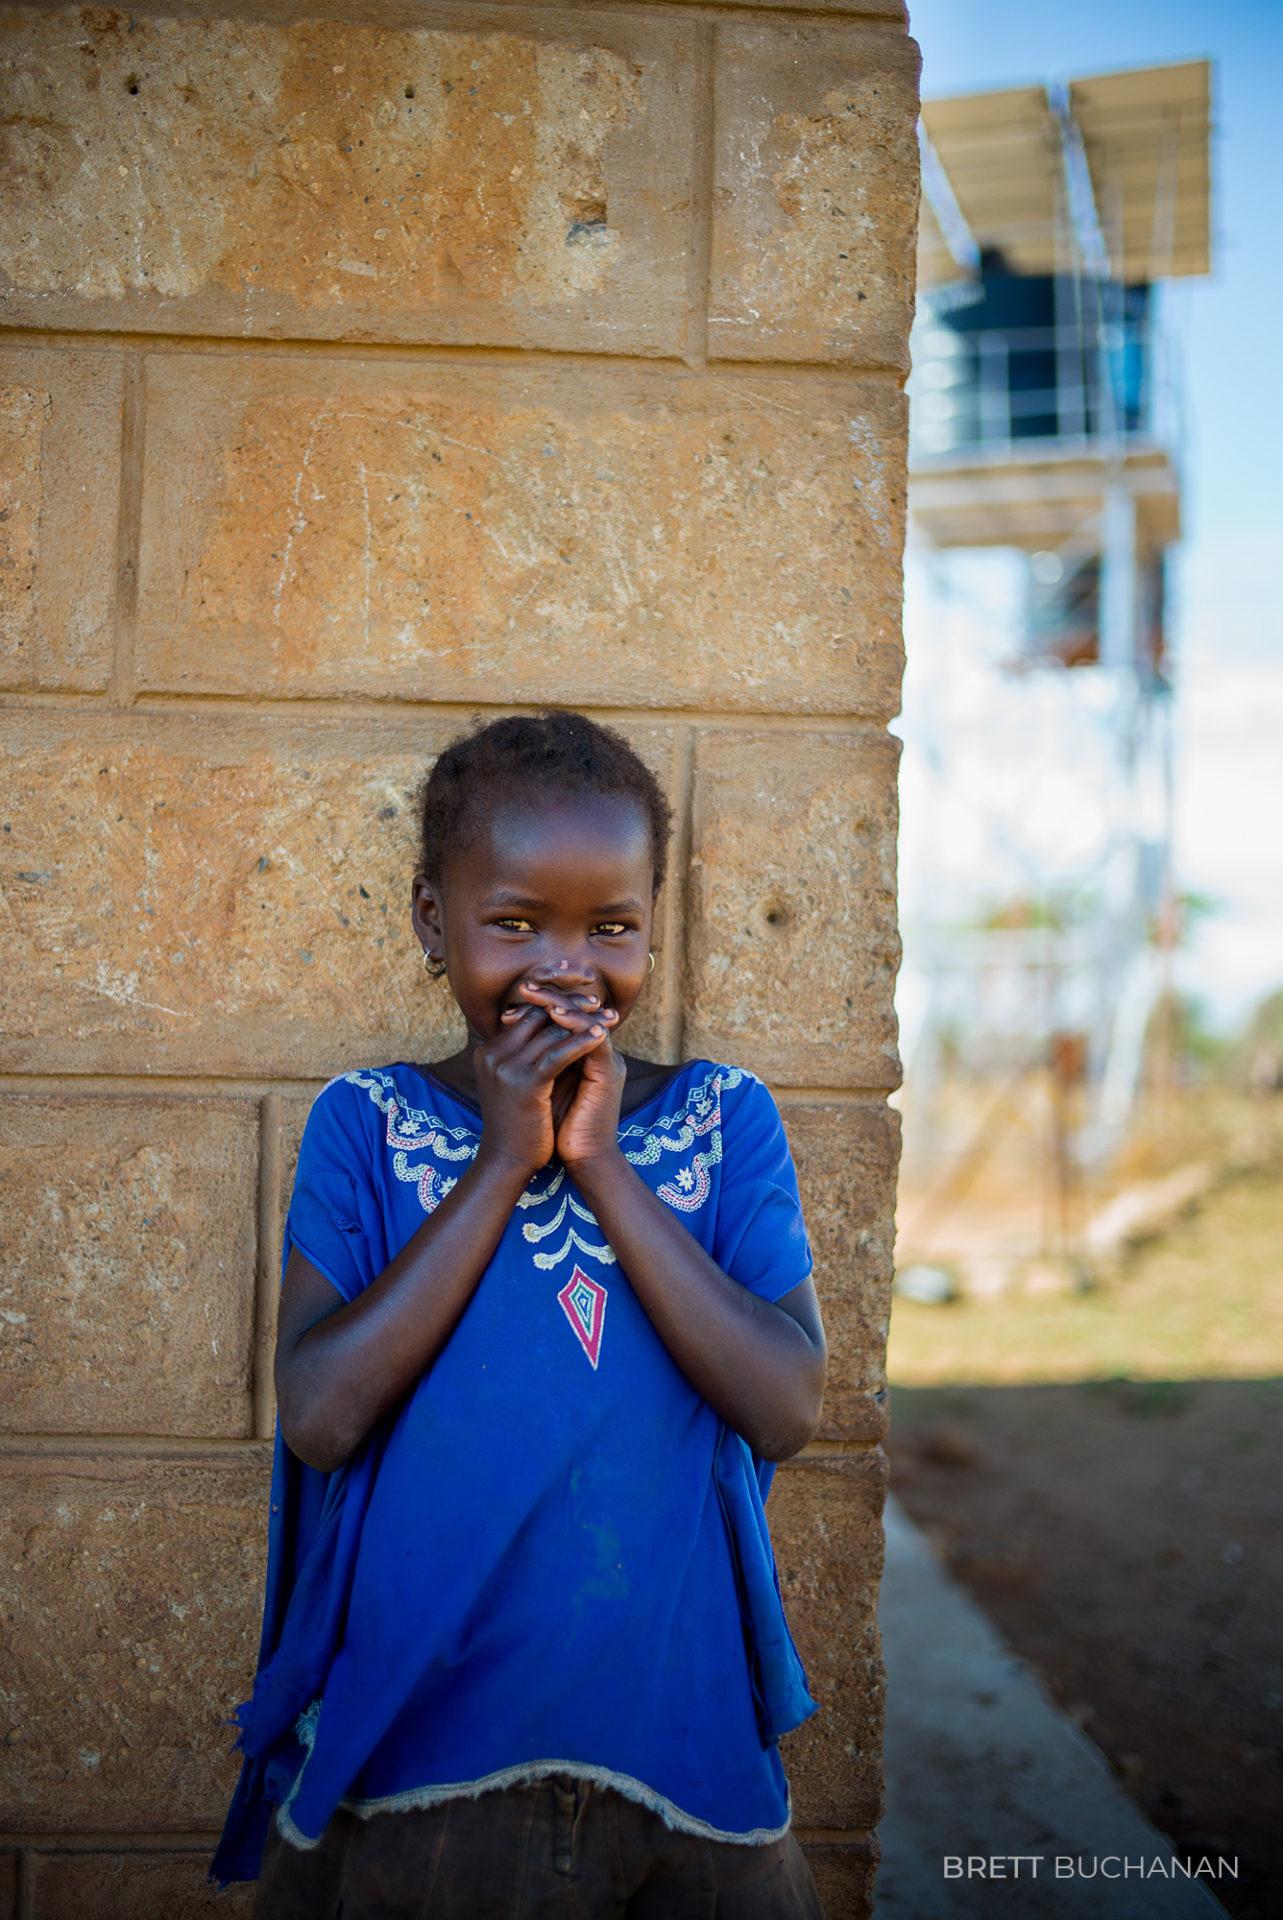 Brett-Buchanan-Kenya-water-development-NGO-36